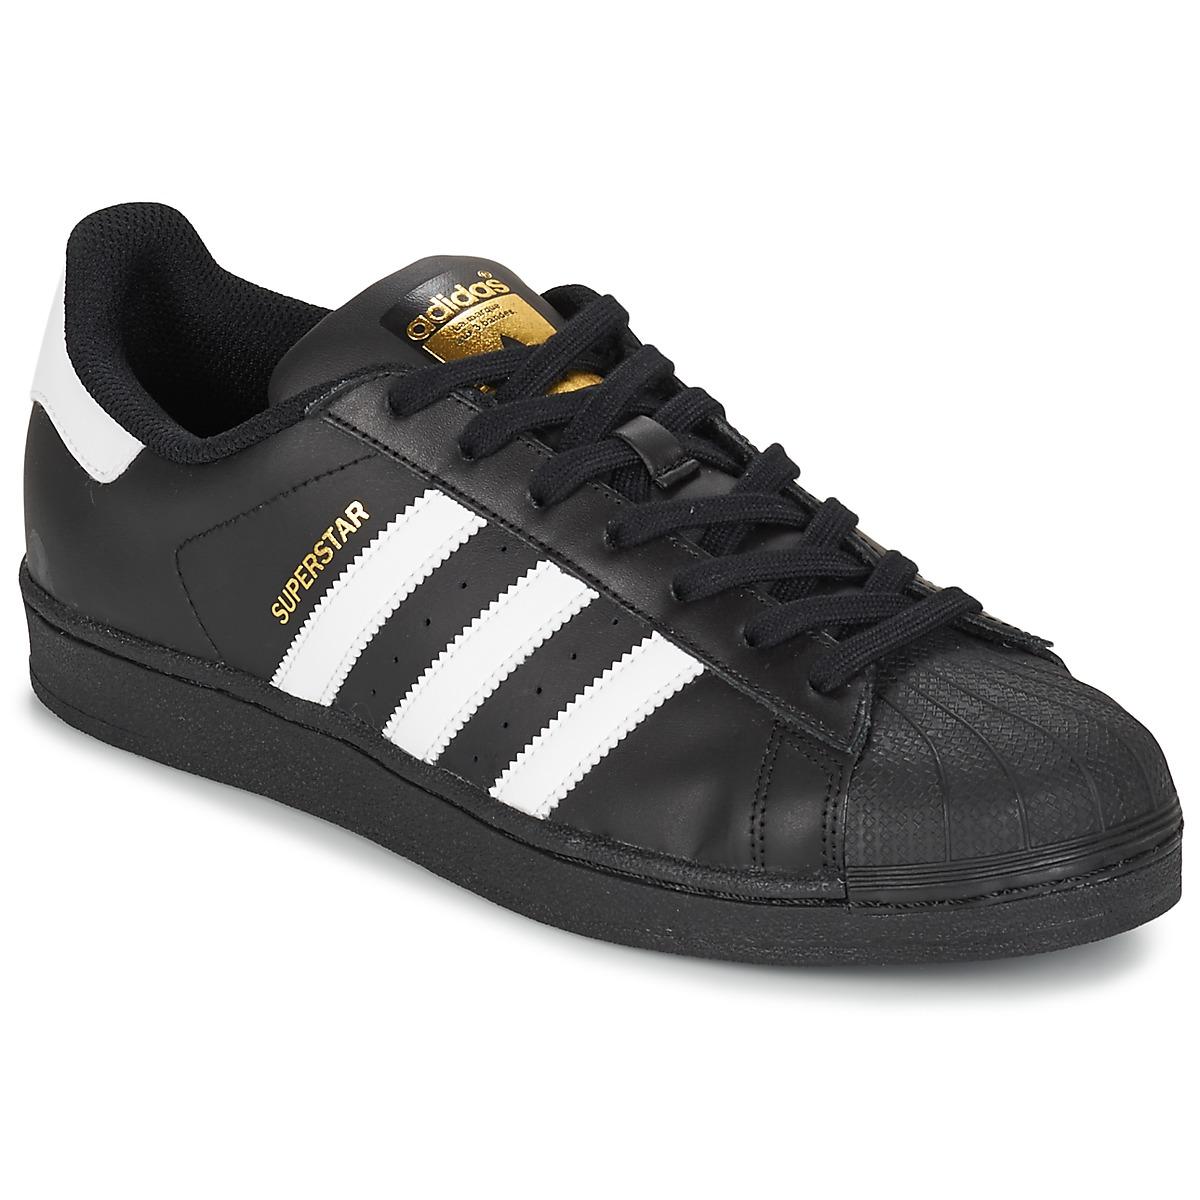 save off 7ed8a 89191 Scarpe Uomo Sneakers basse adidas Originals SUPERSTAR FOUNDATION Bianco   Nero